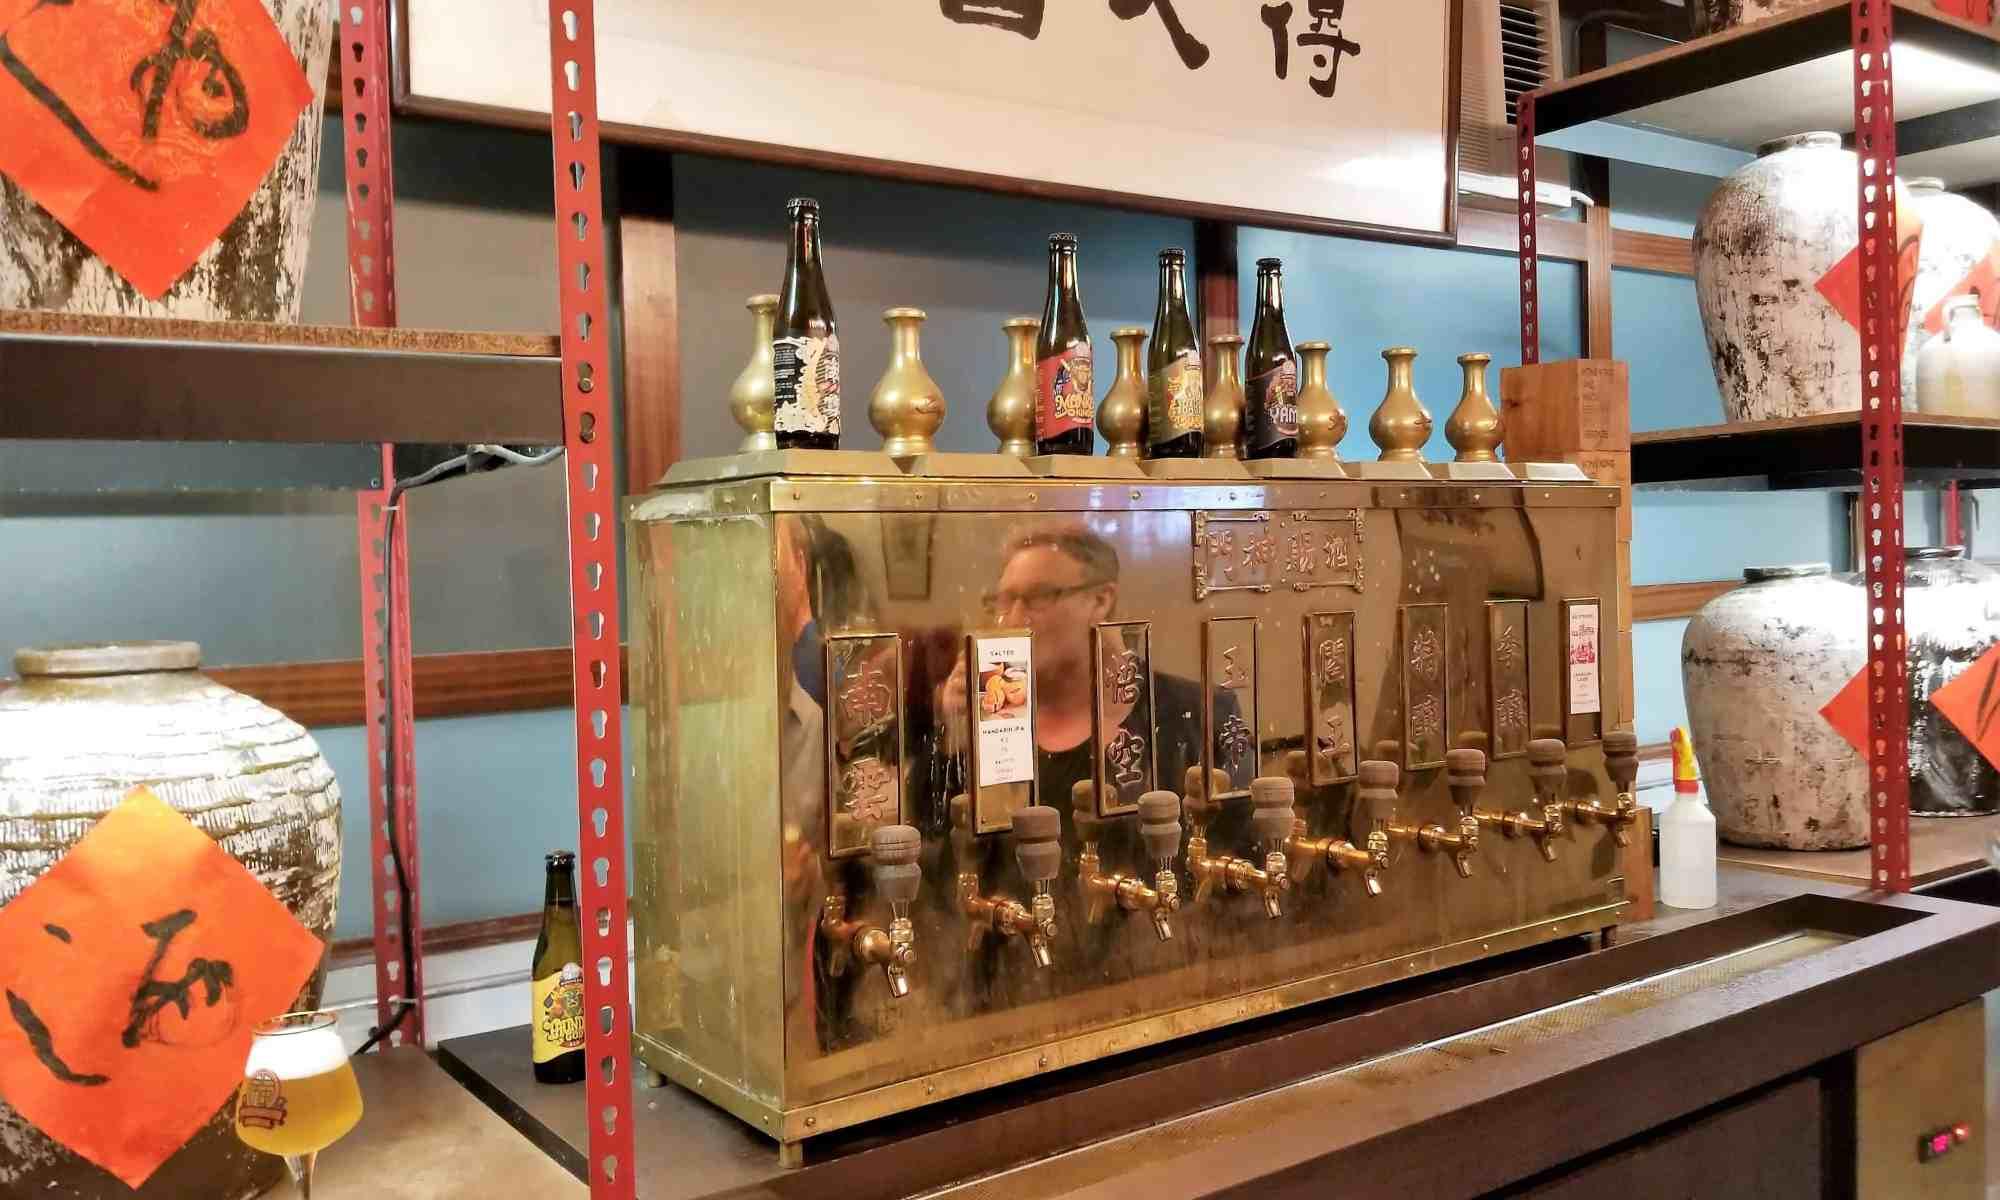 image-of-moonzen-brewery-kwuntong-kowloon-hongkong-craft-beer-taproom